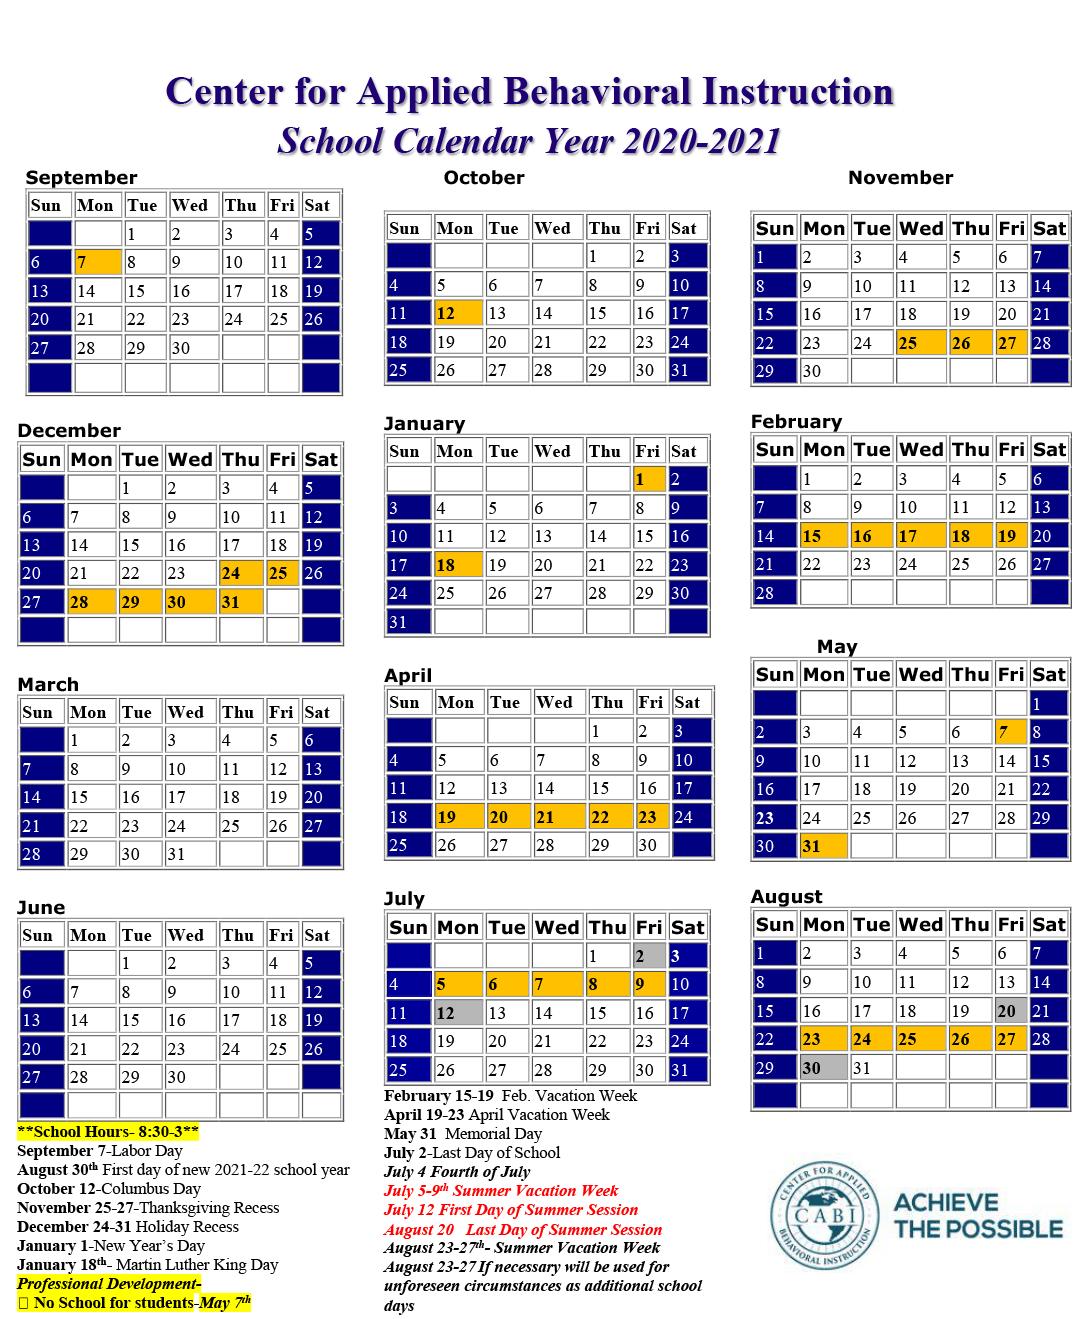 Wsesu 2021-22 Calendar School Calendar   Center for Applied Behavioral Instruction